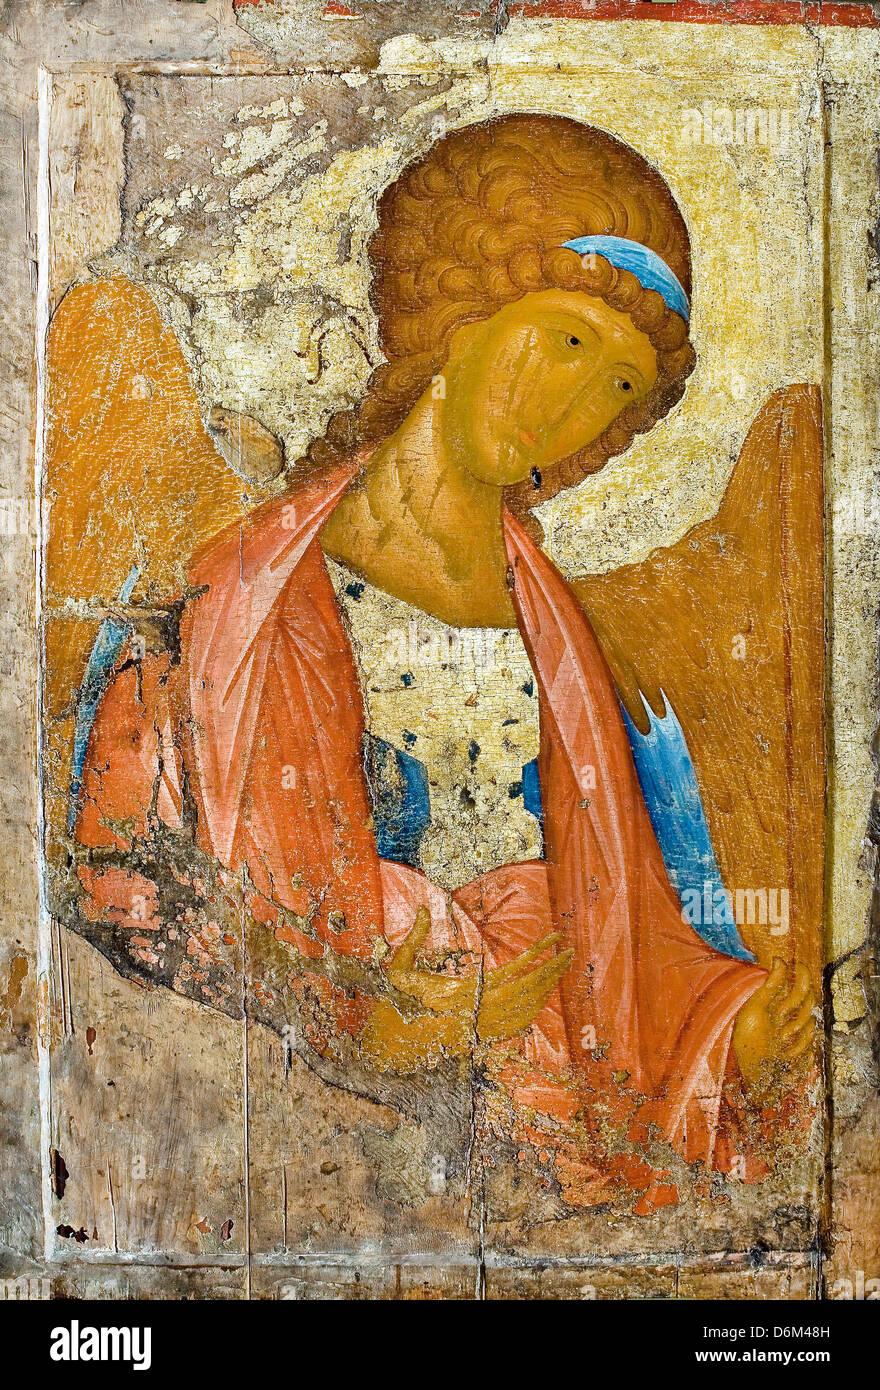 Andrei Rublev, Archangel Michael. From the Deisus Chin (Row) ('Zvenigorodsky') 1410s. Tempera on wood. Tretyakov - Stock Image